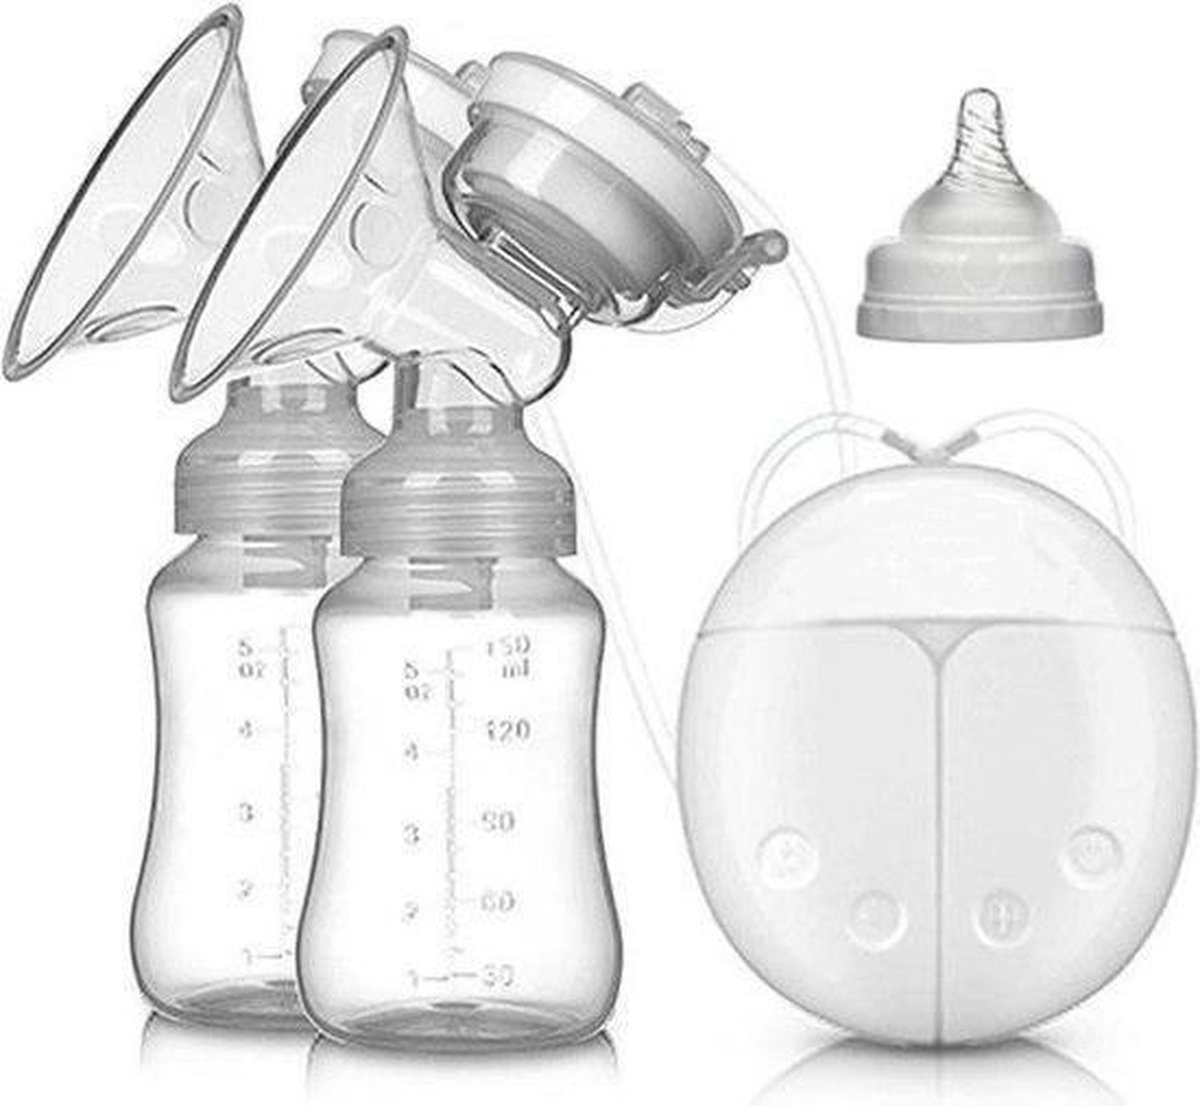 BYER Elektrische dubbele borstkolf kolfapparaat - 2 kolven - 100% BPA-Vrij - 150 ml